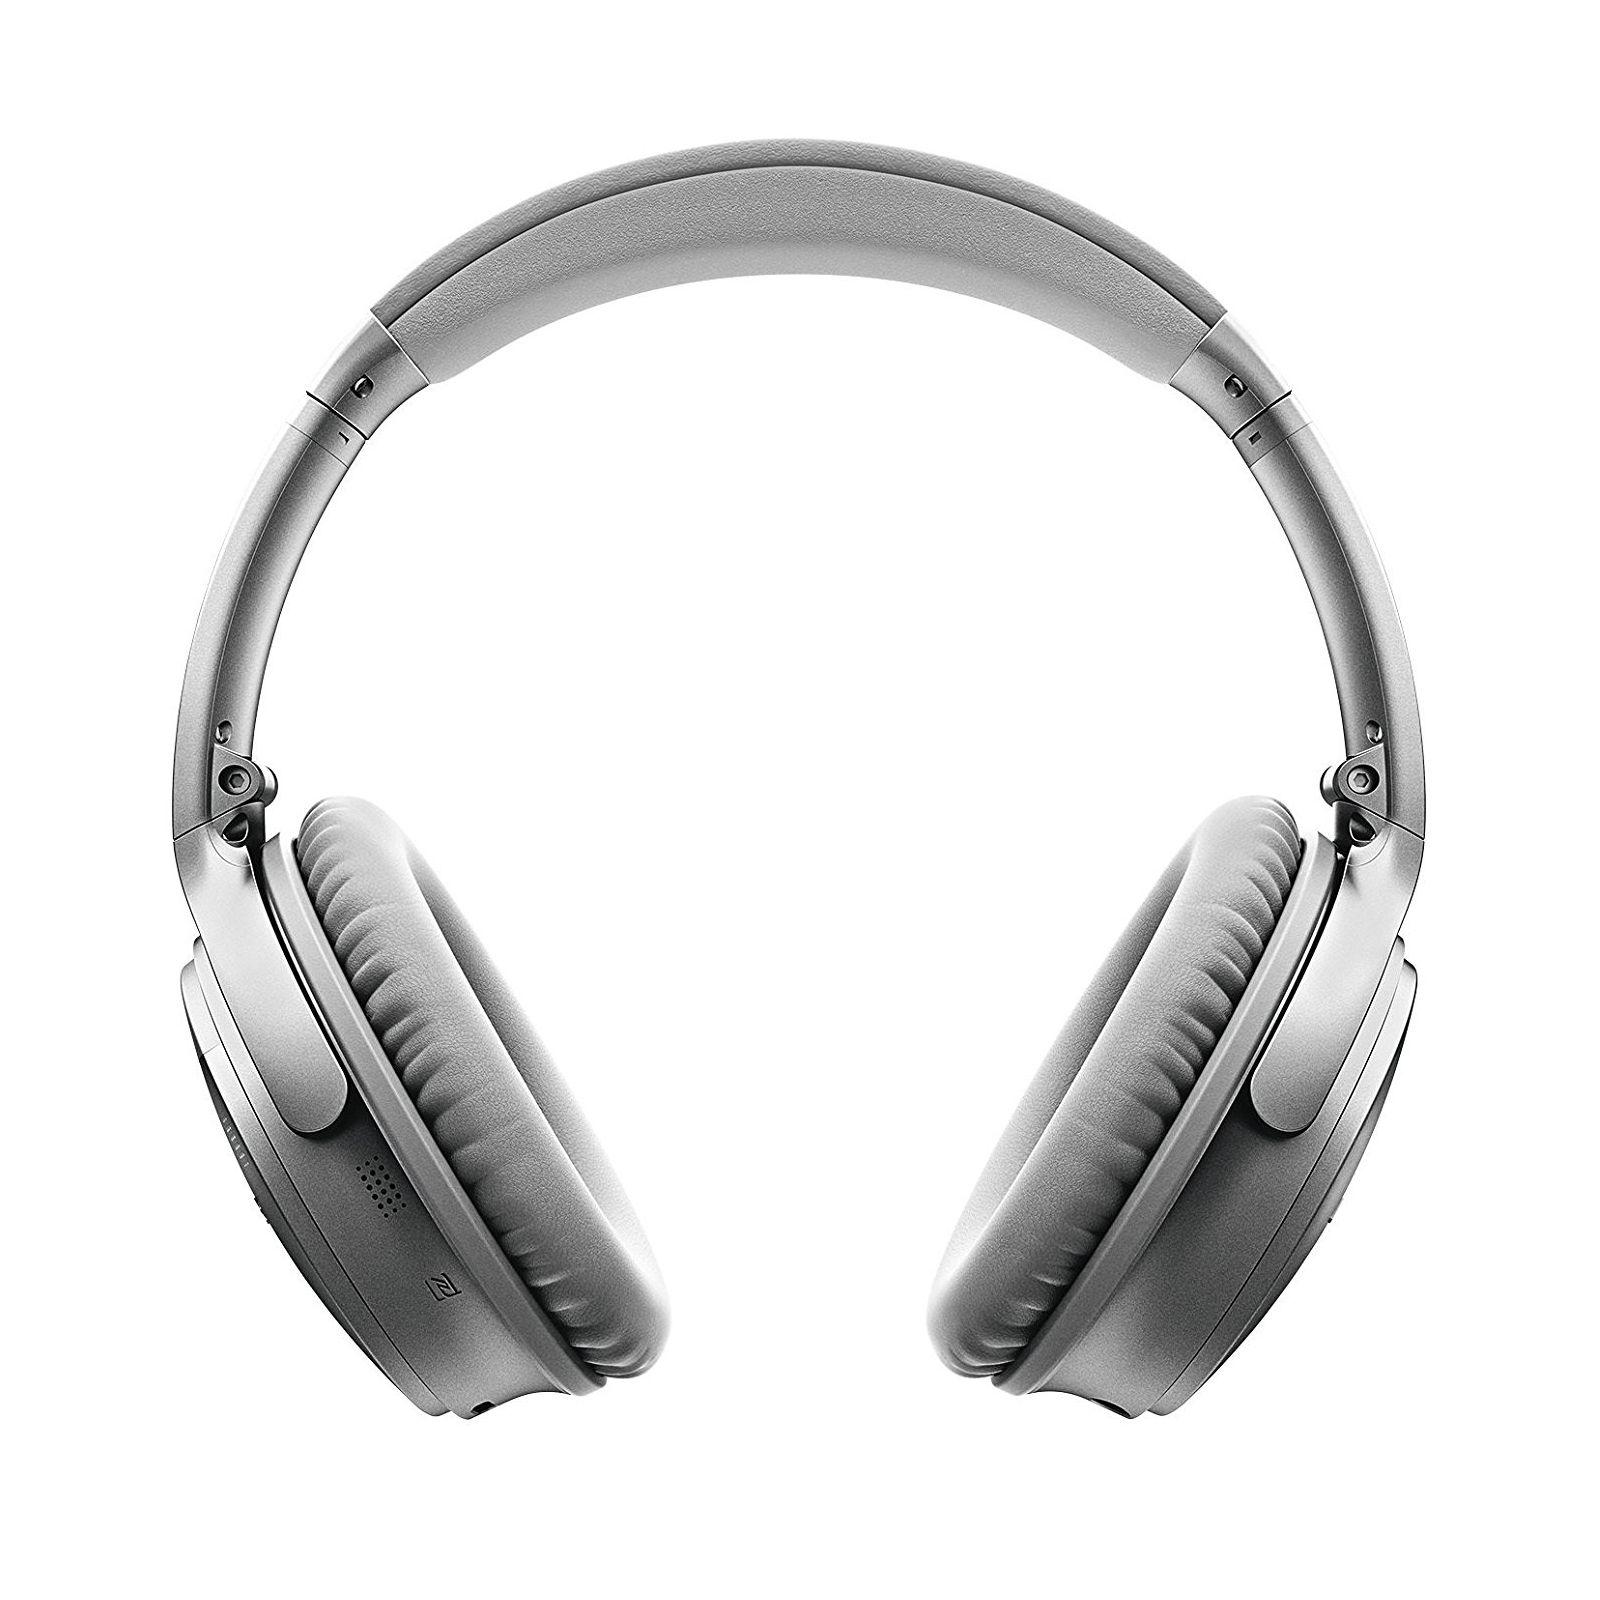 Bose QC35 Series IIWireless Headphones